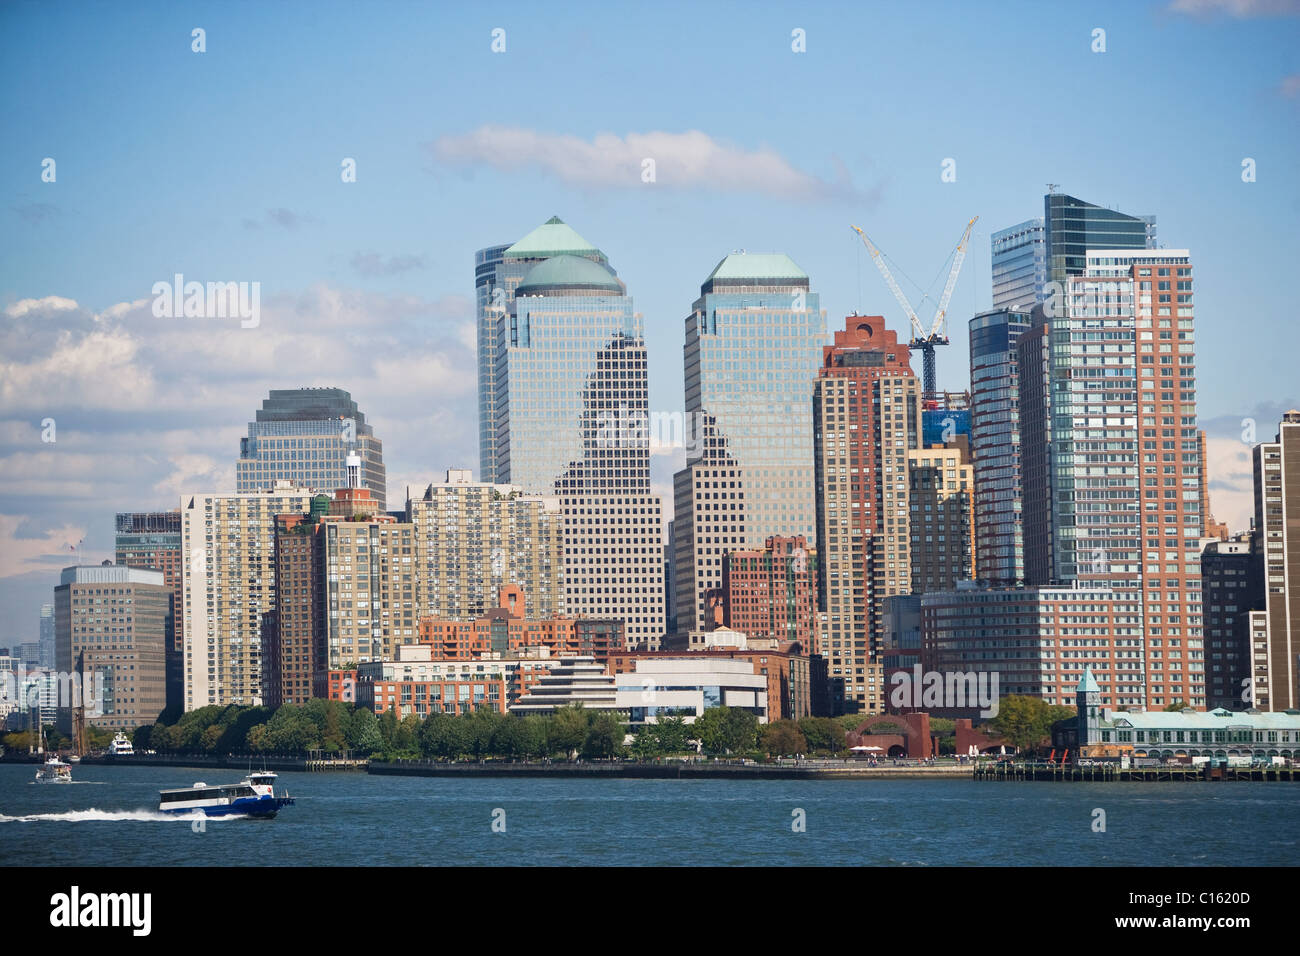 New York City skyline, New York State, USA - Stock Image